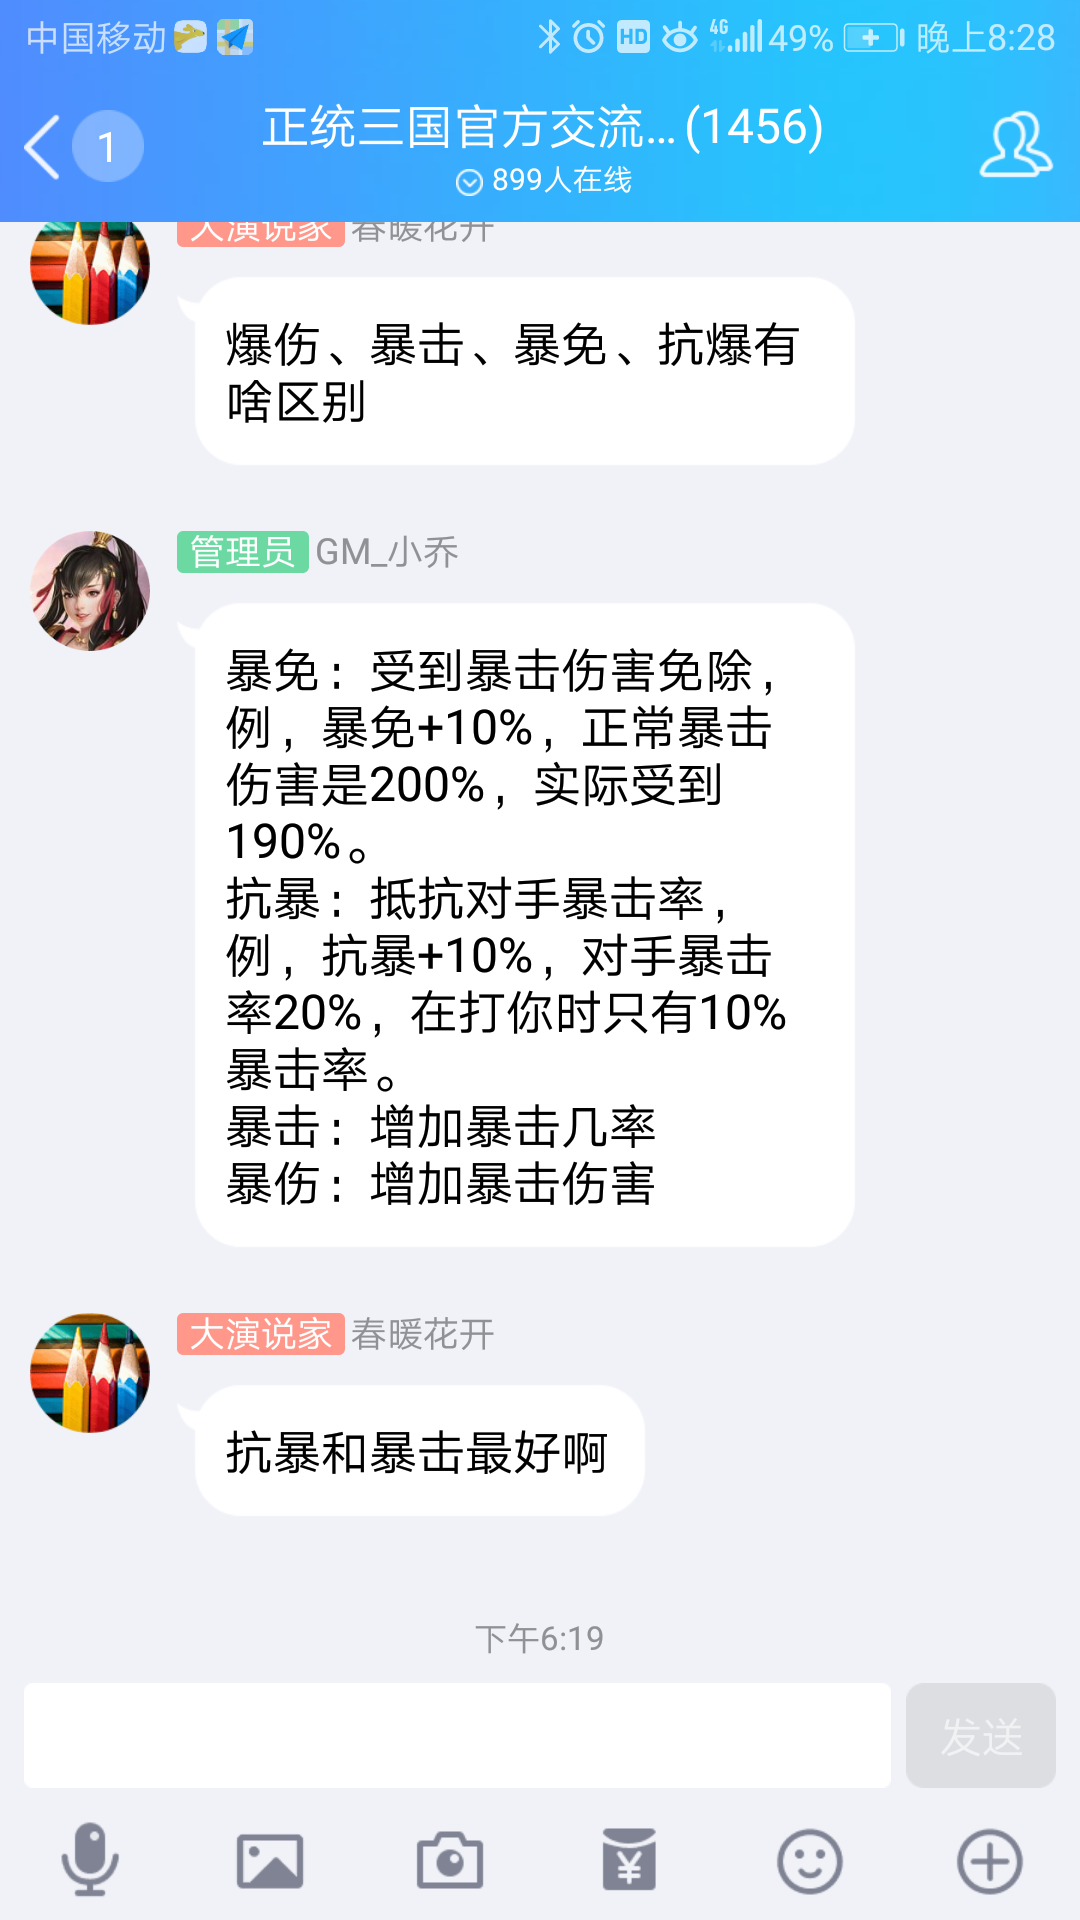 Screenshot_20190223-202821.png